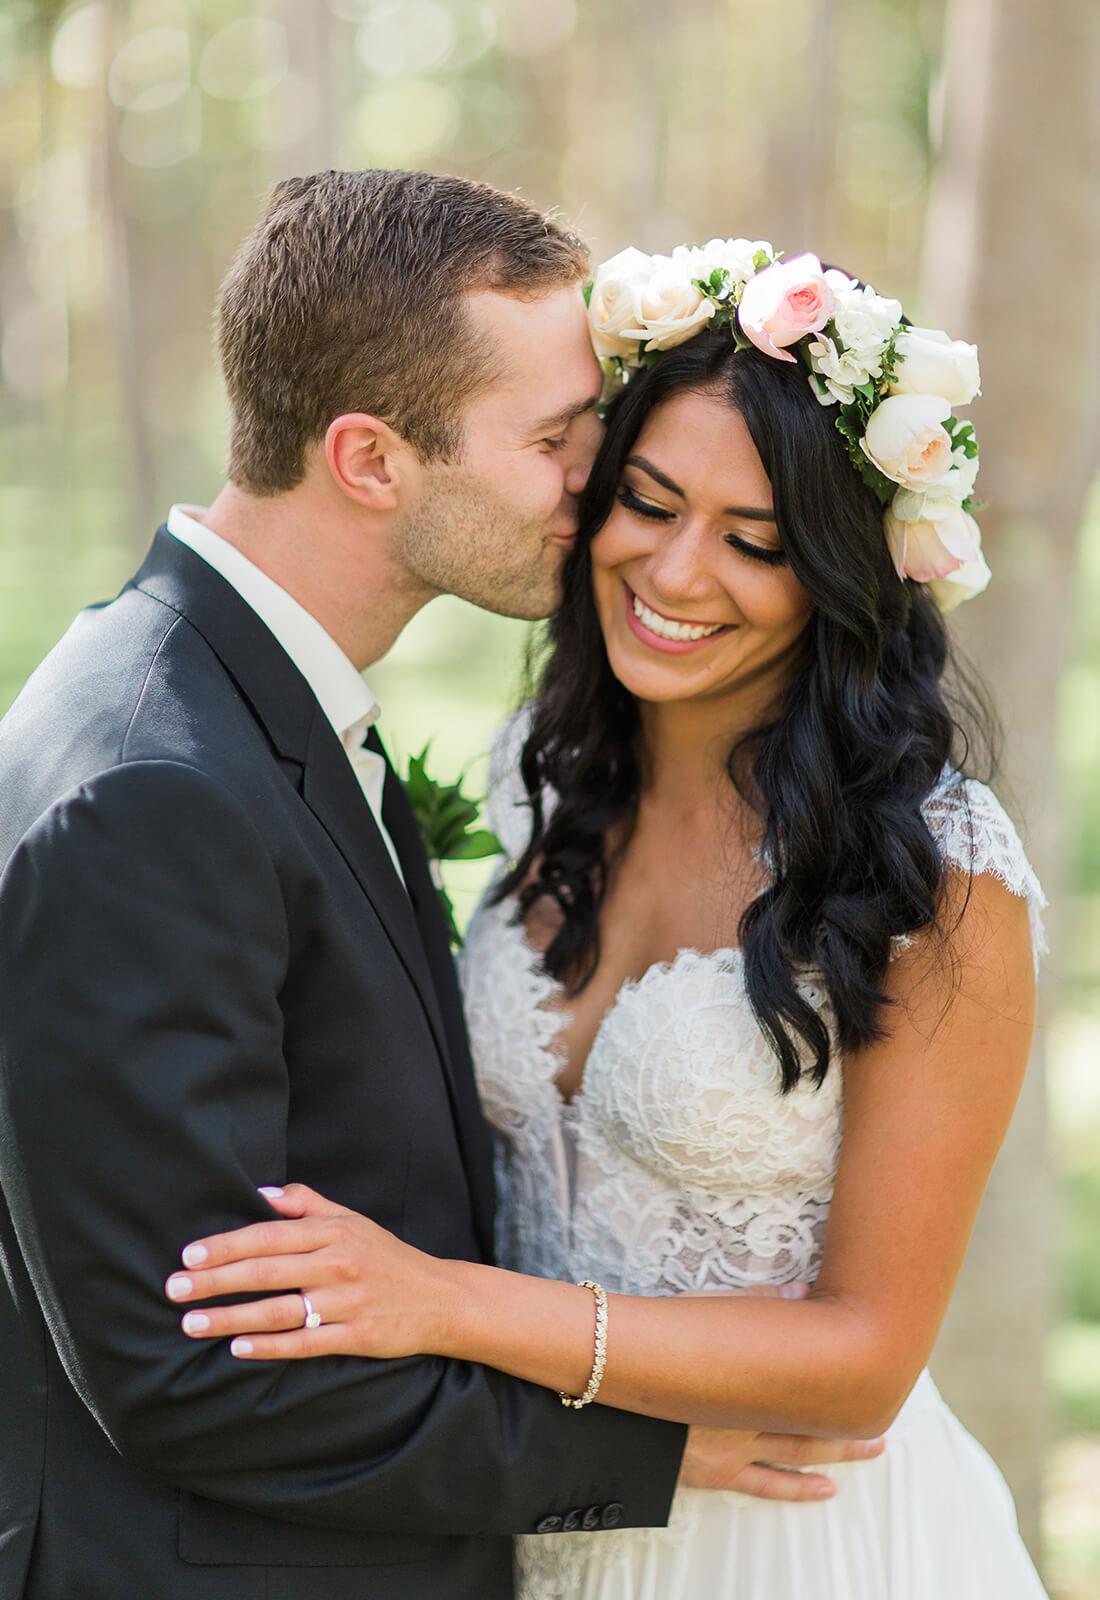 Mindy nagra wedding